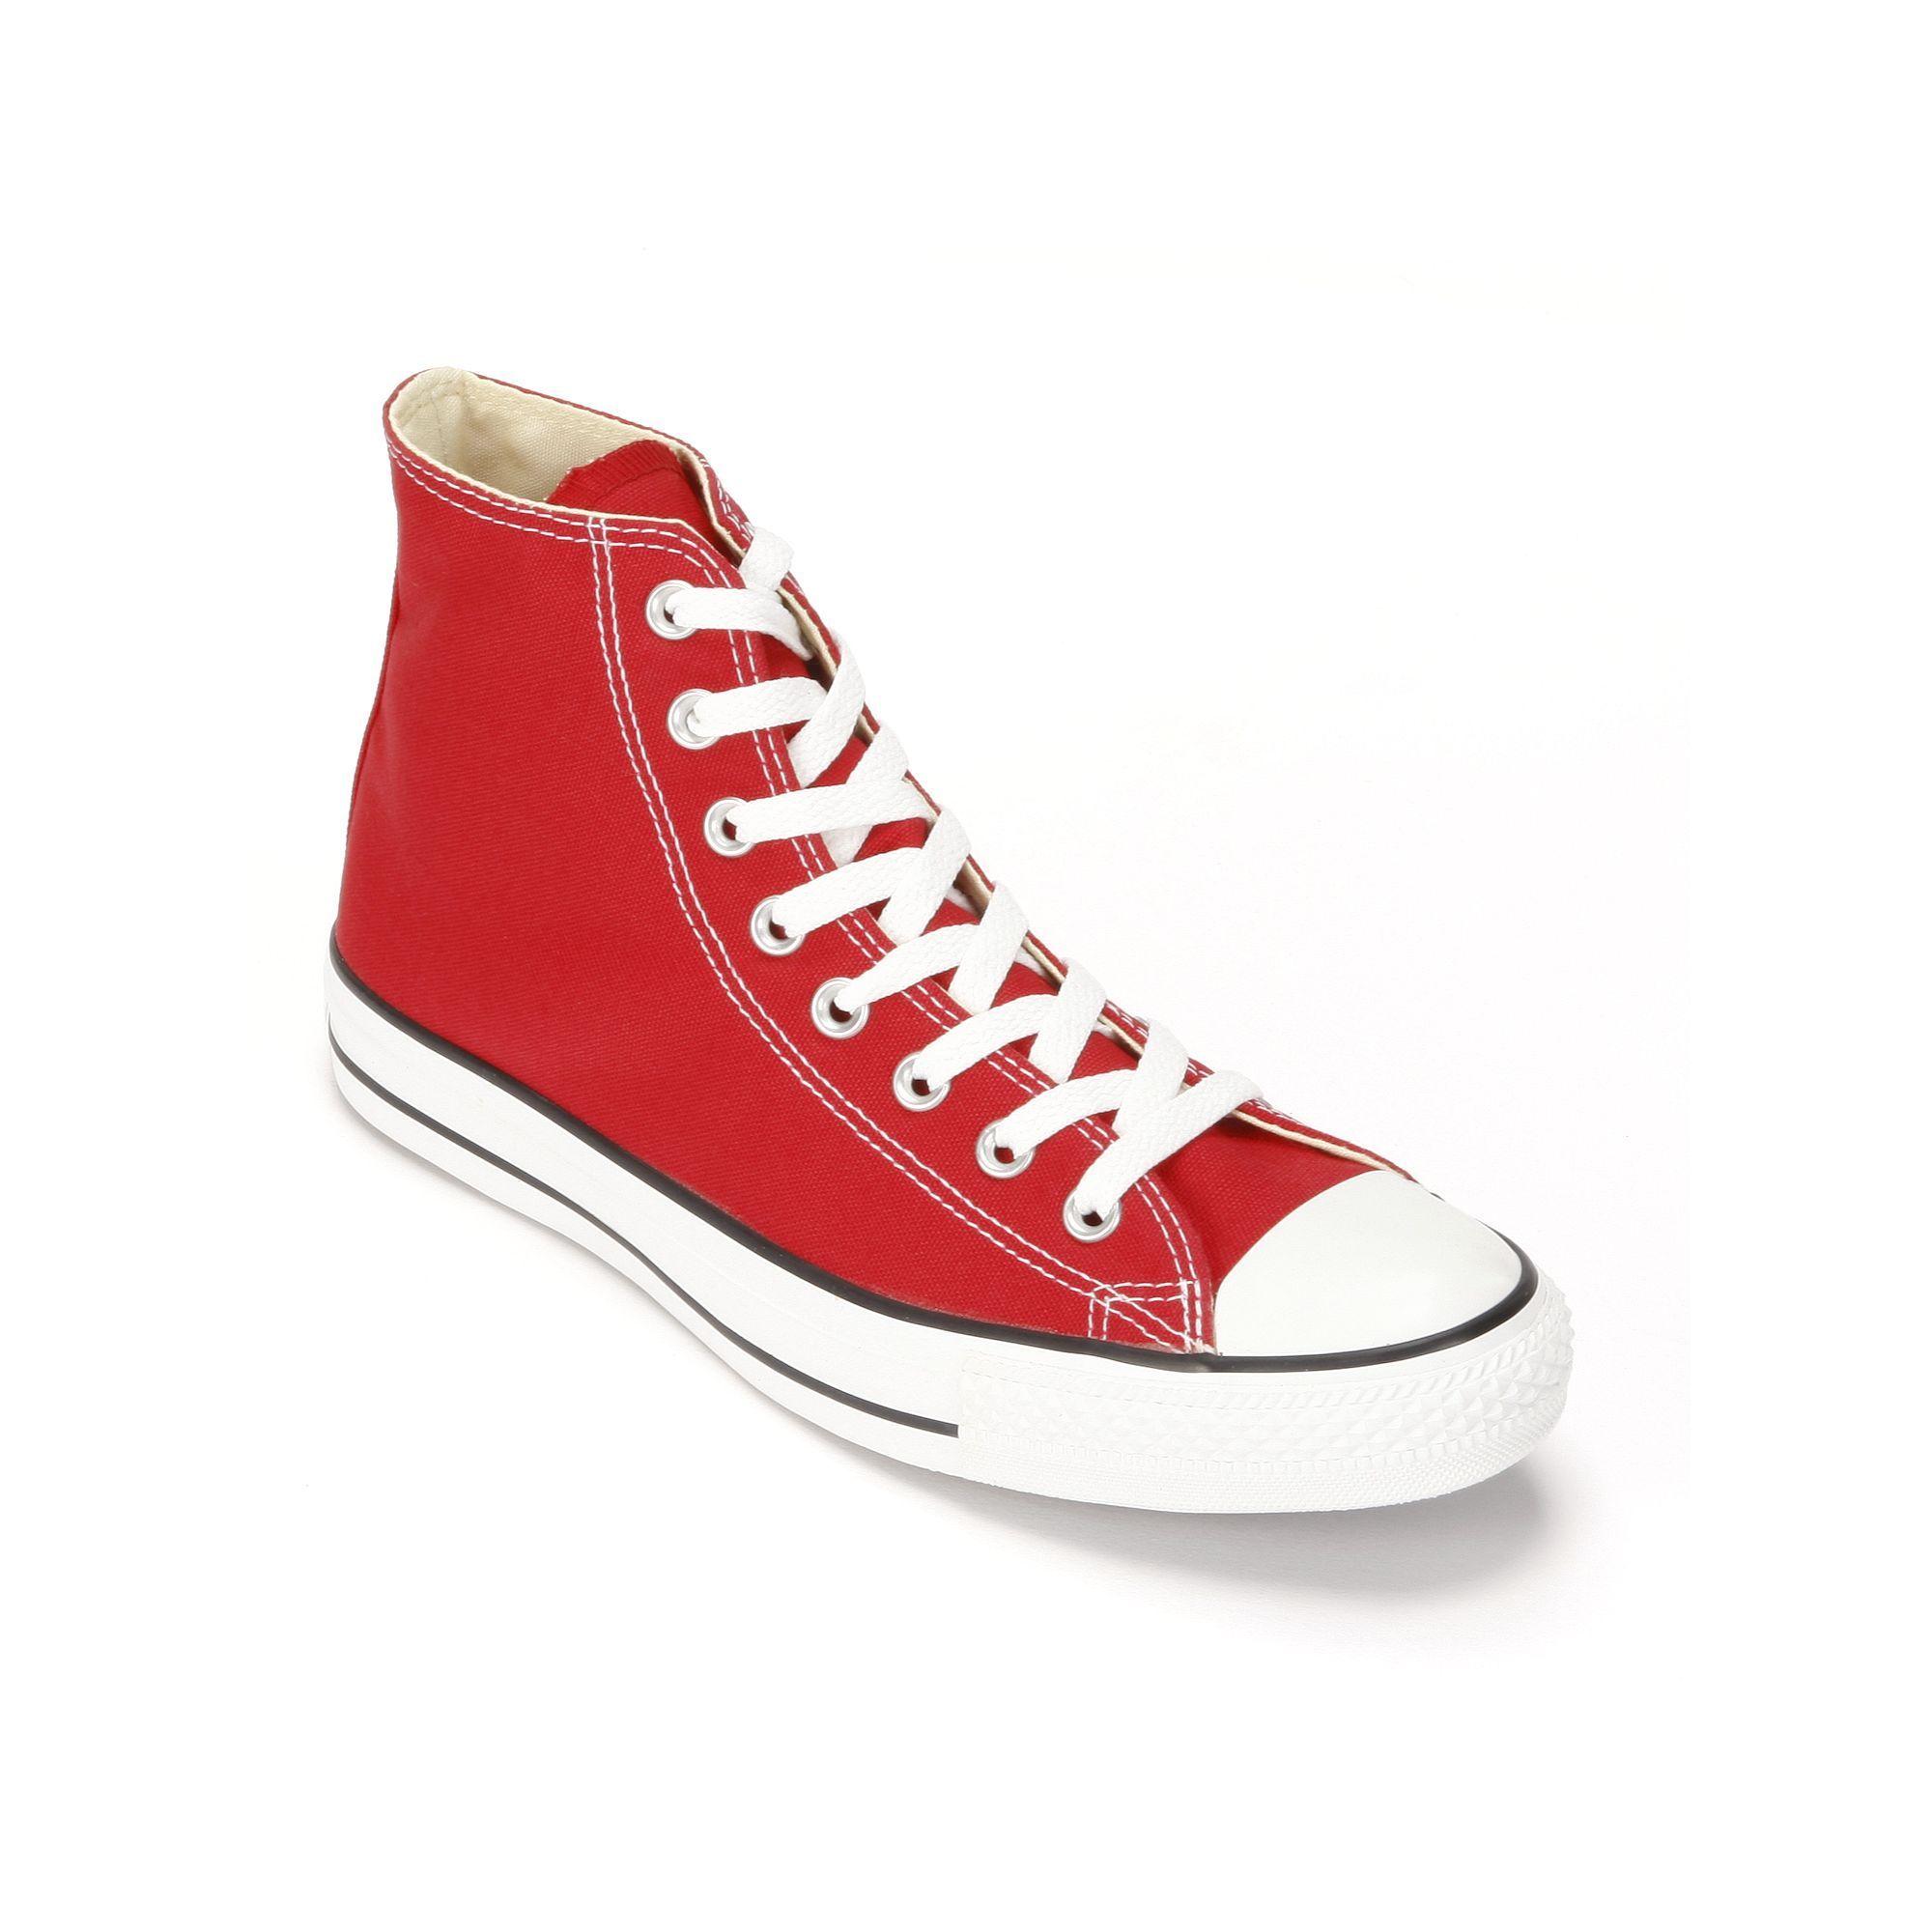 7deddb367ddb Adult Converse All Star Chuck Taylor High-Top Sneakers